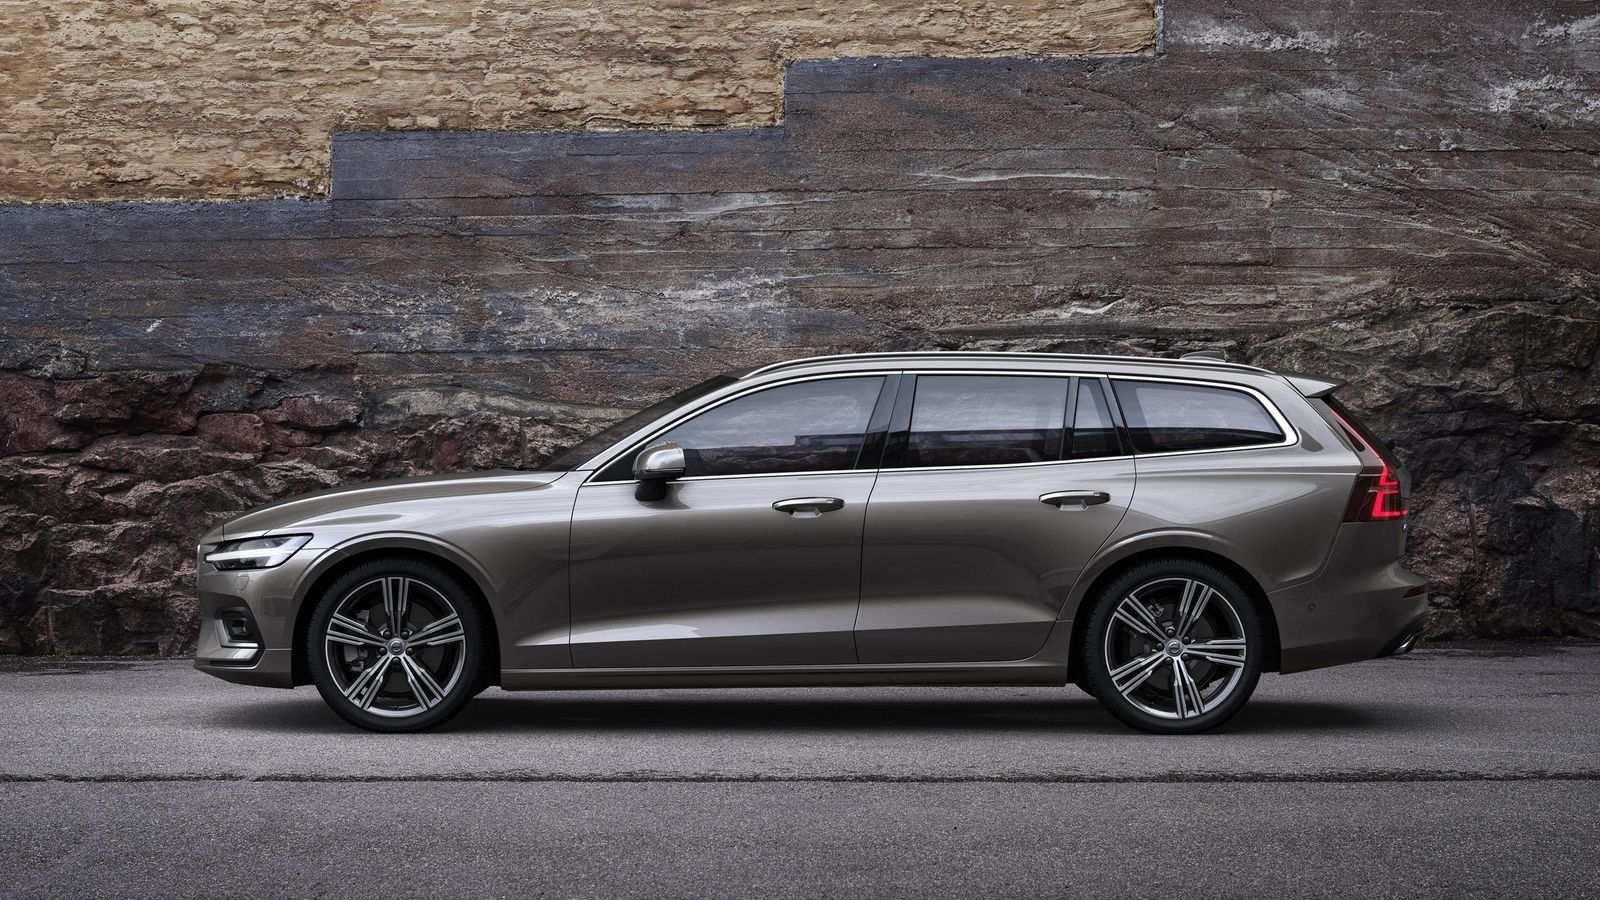 29 All New Volvo V60 2019 Engine with Volvo V60 2019